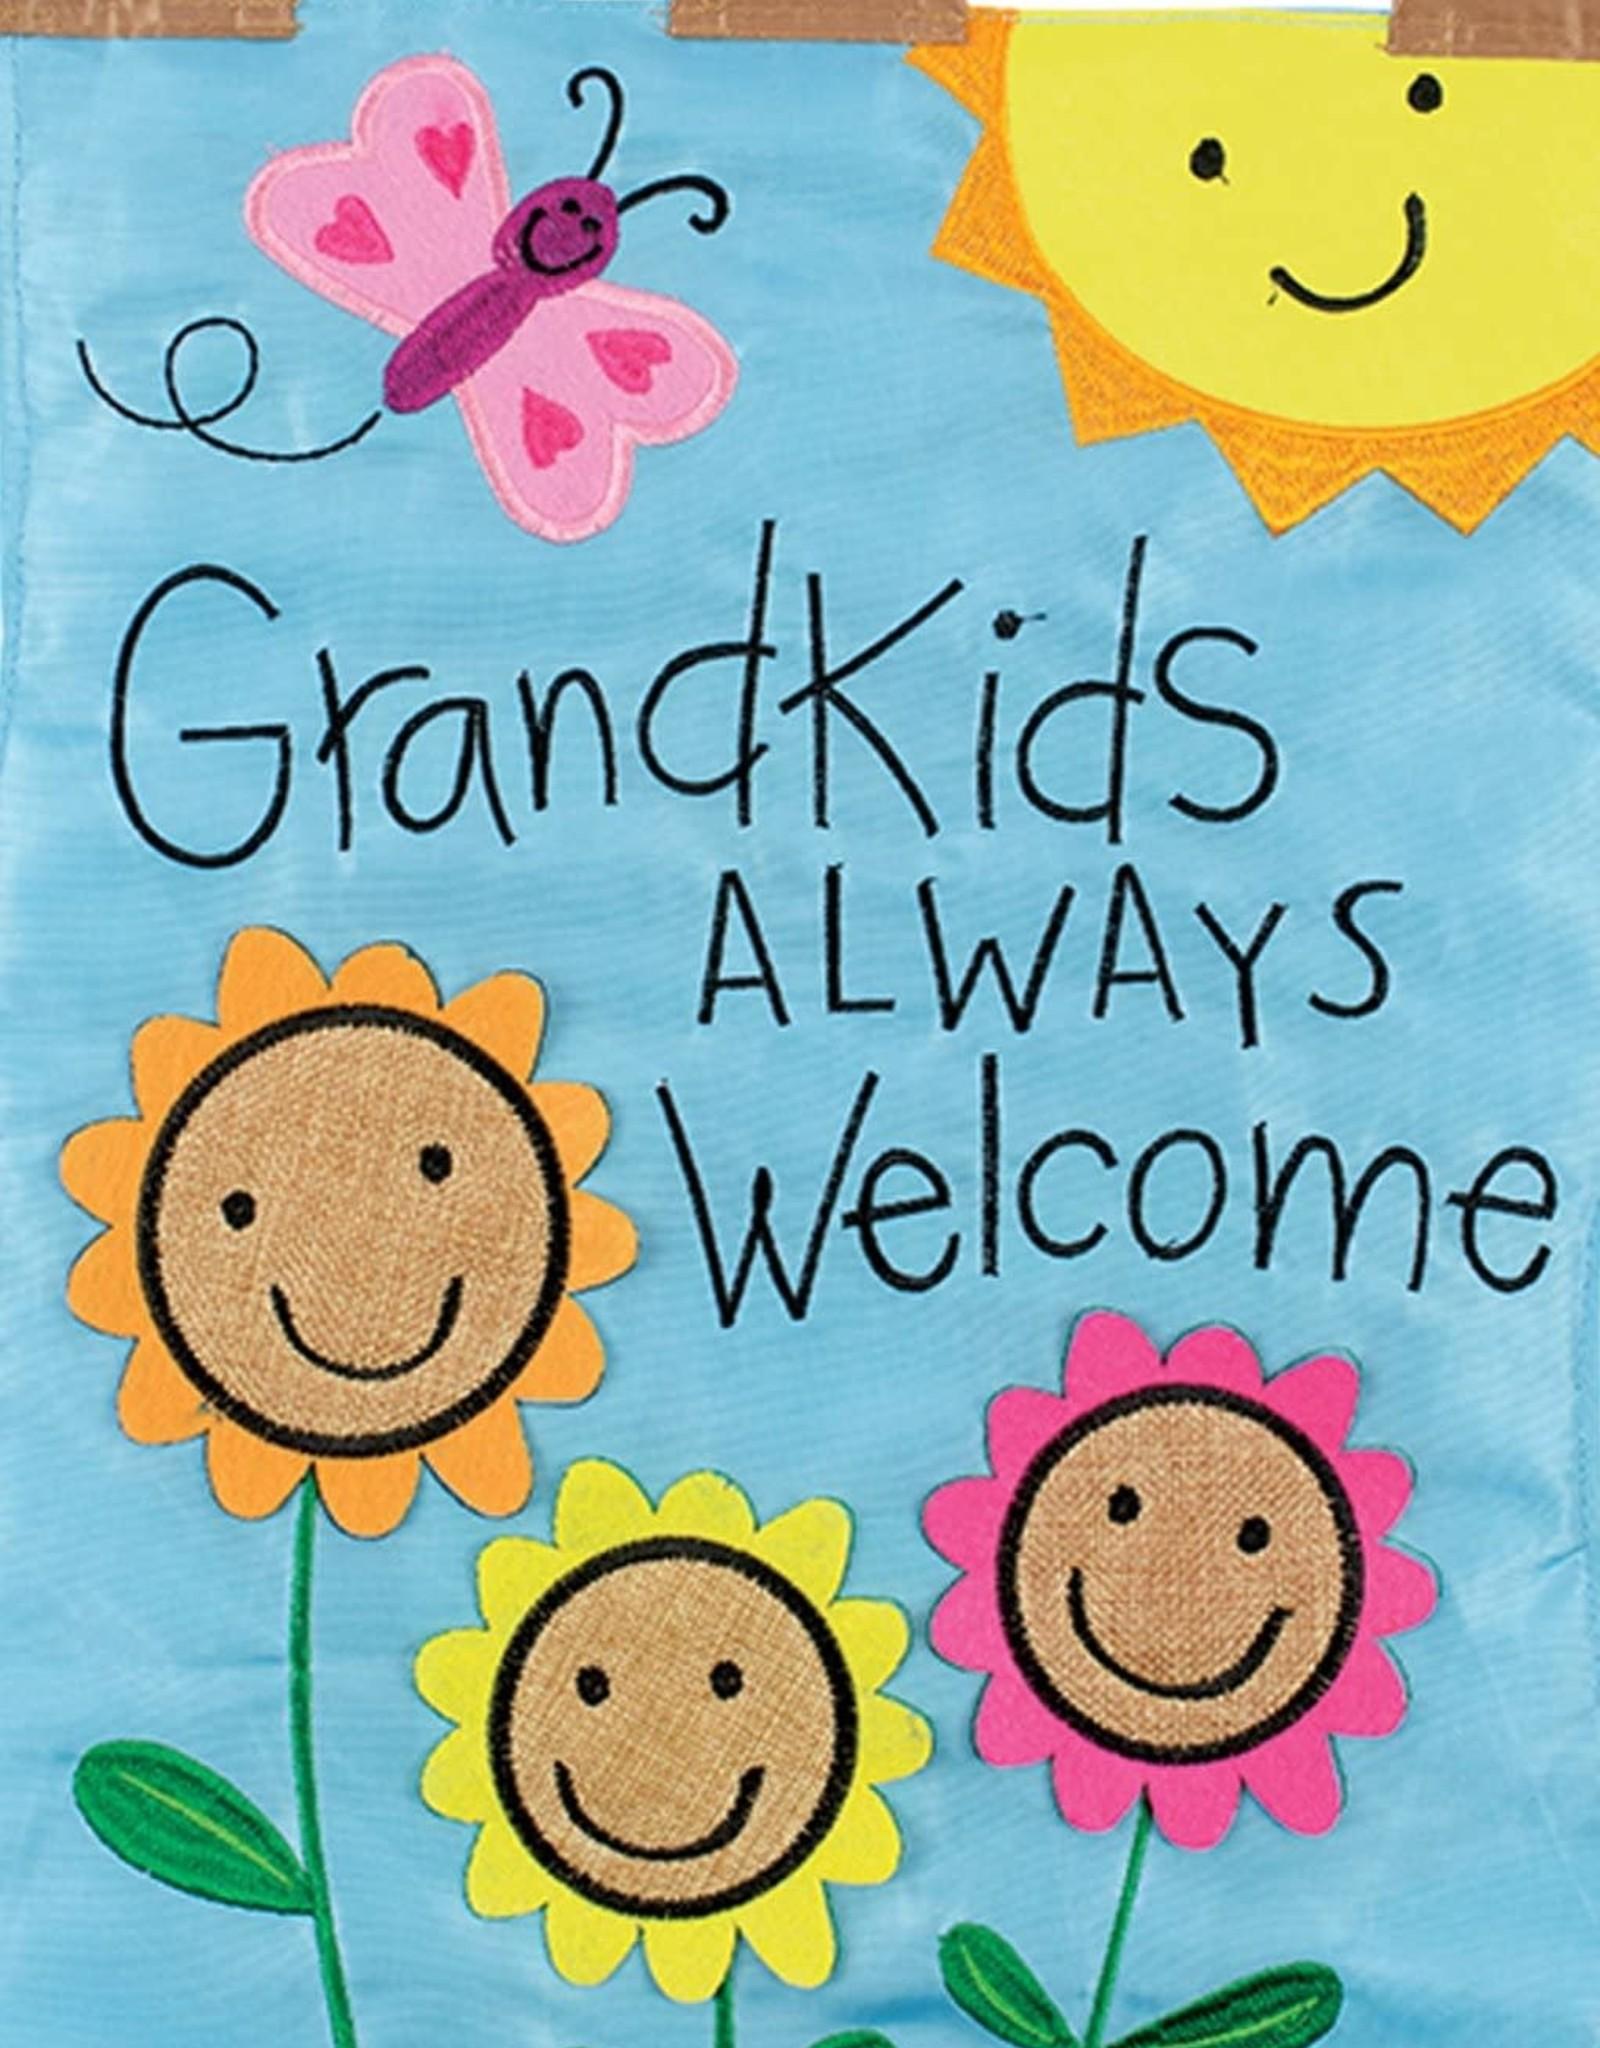 Carson C Grandkids Welcome GF